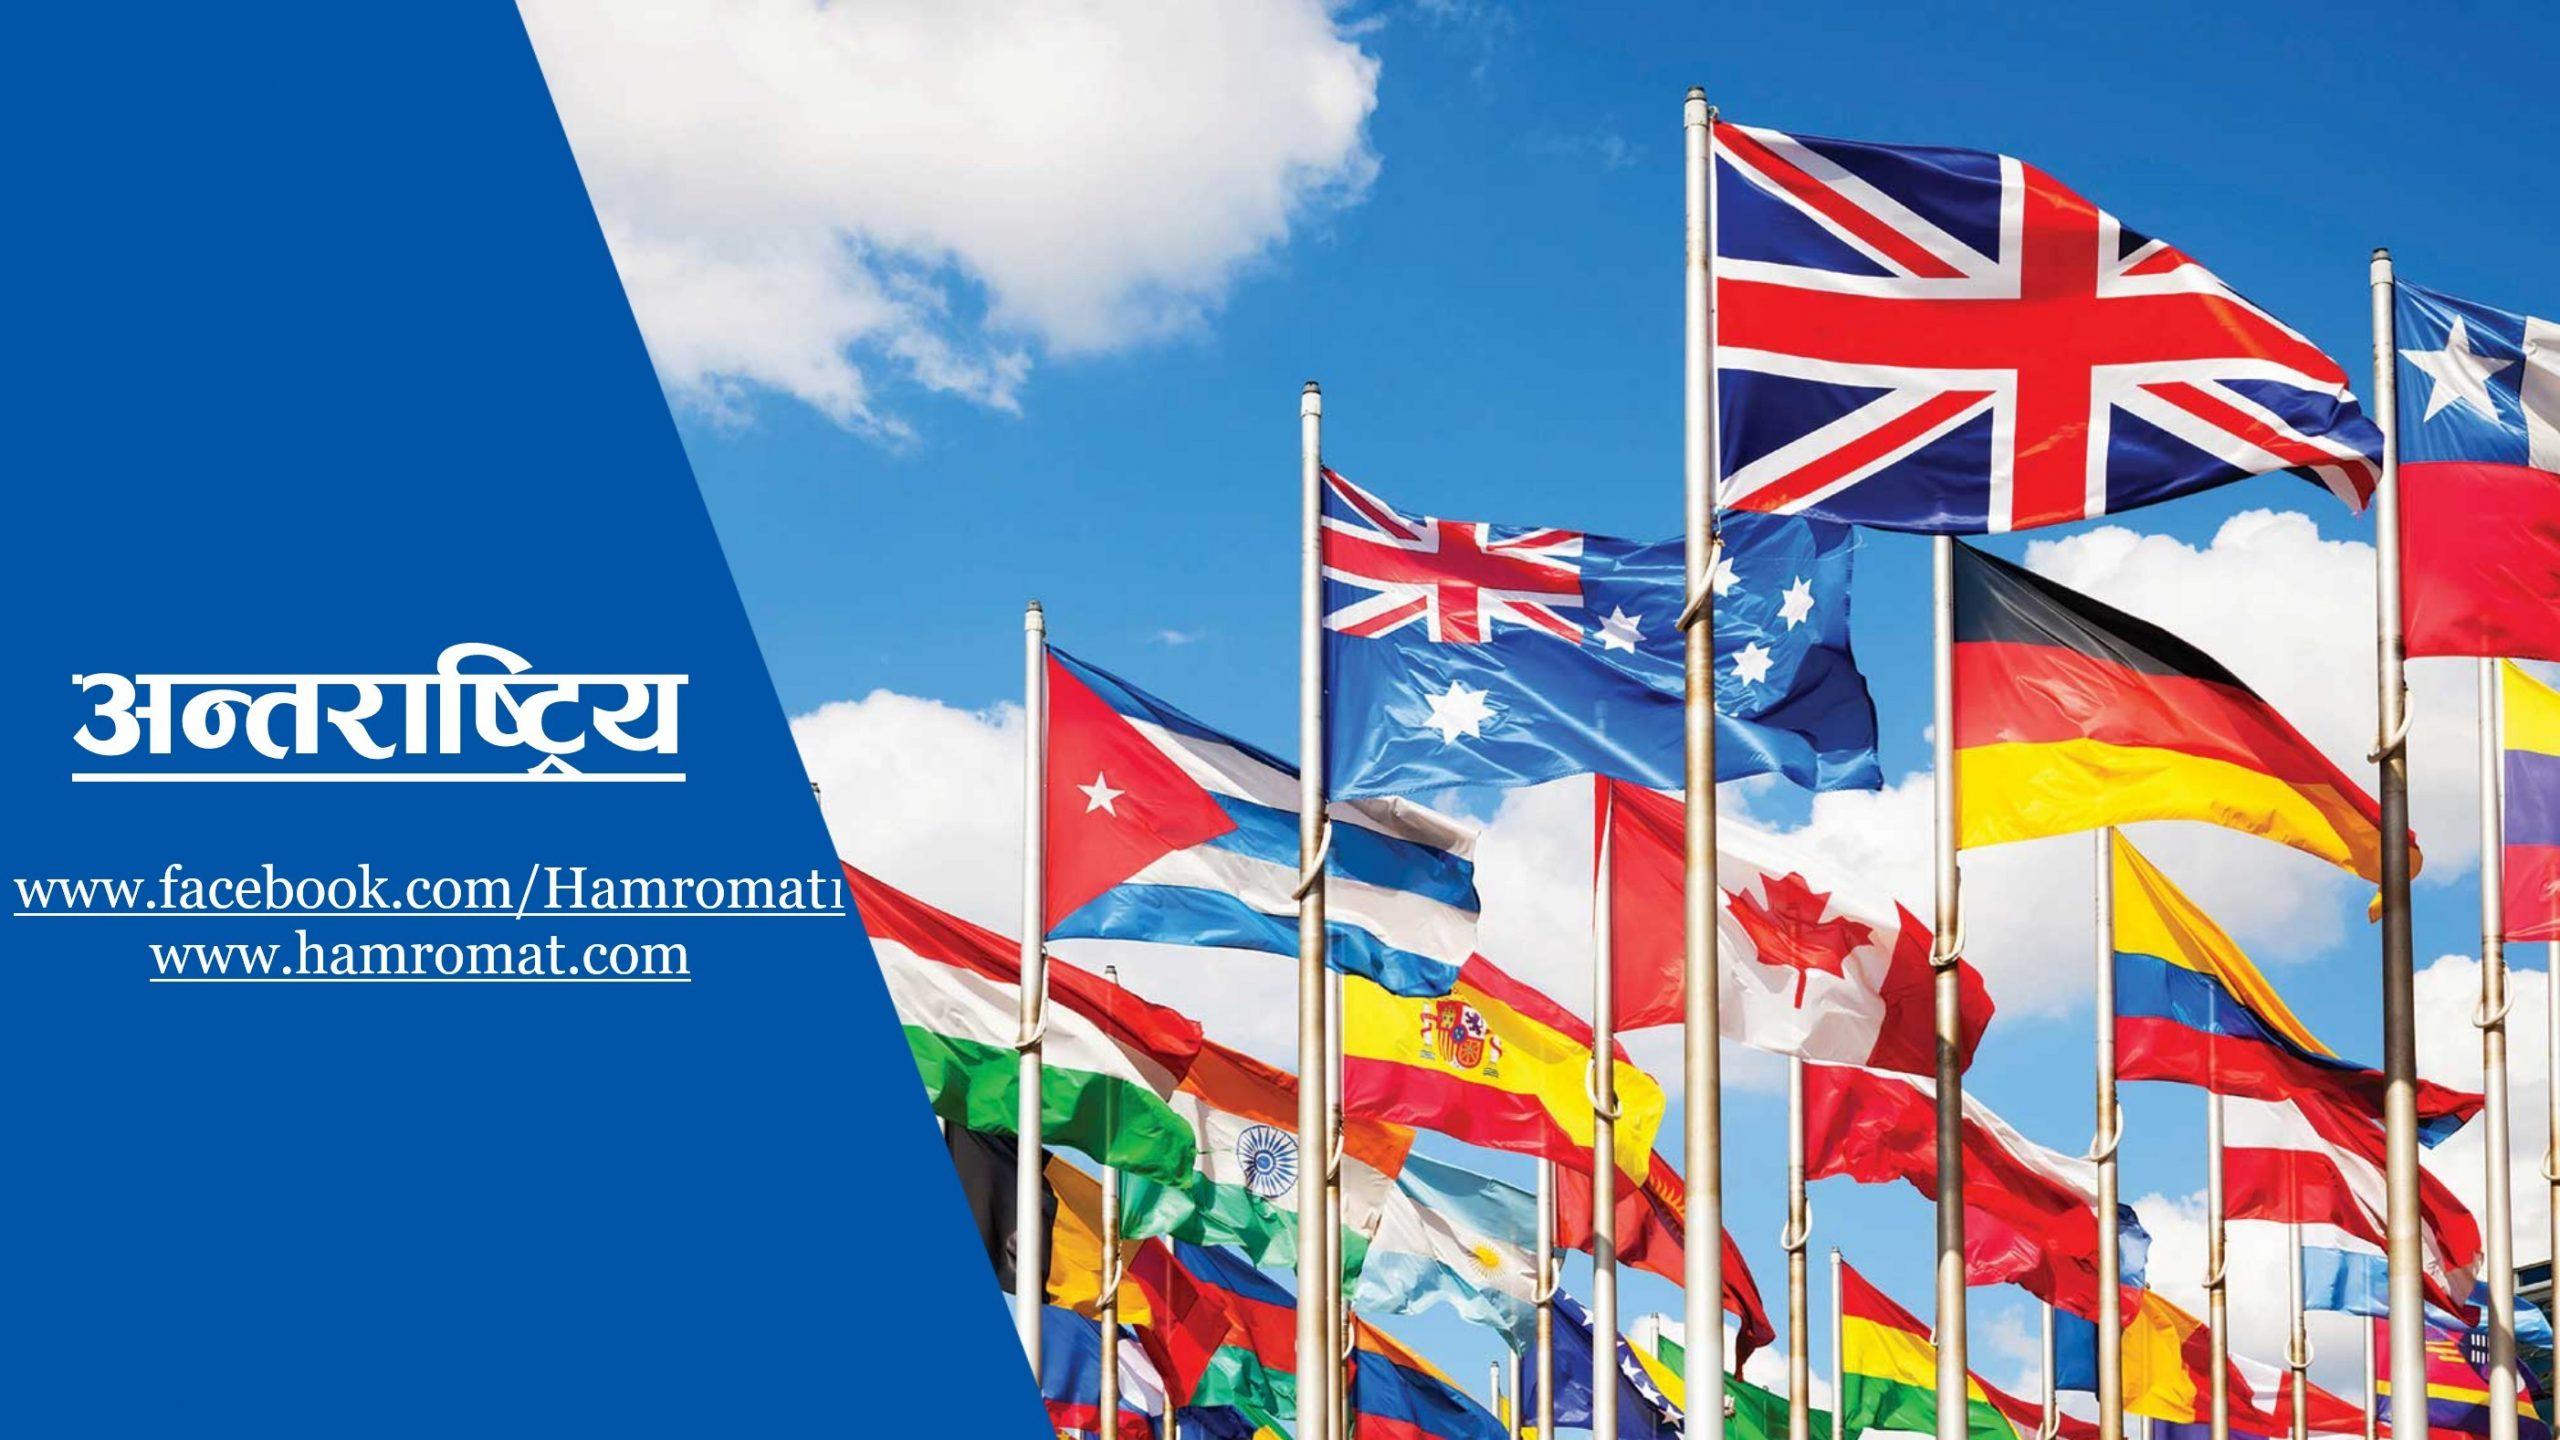 विदेशमा रहेका नागरिक नेपाल फर्किने क्रम जारी